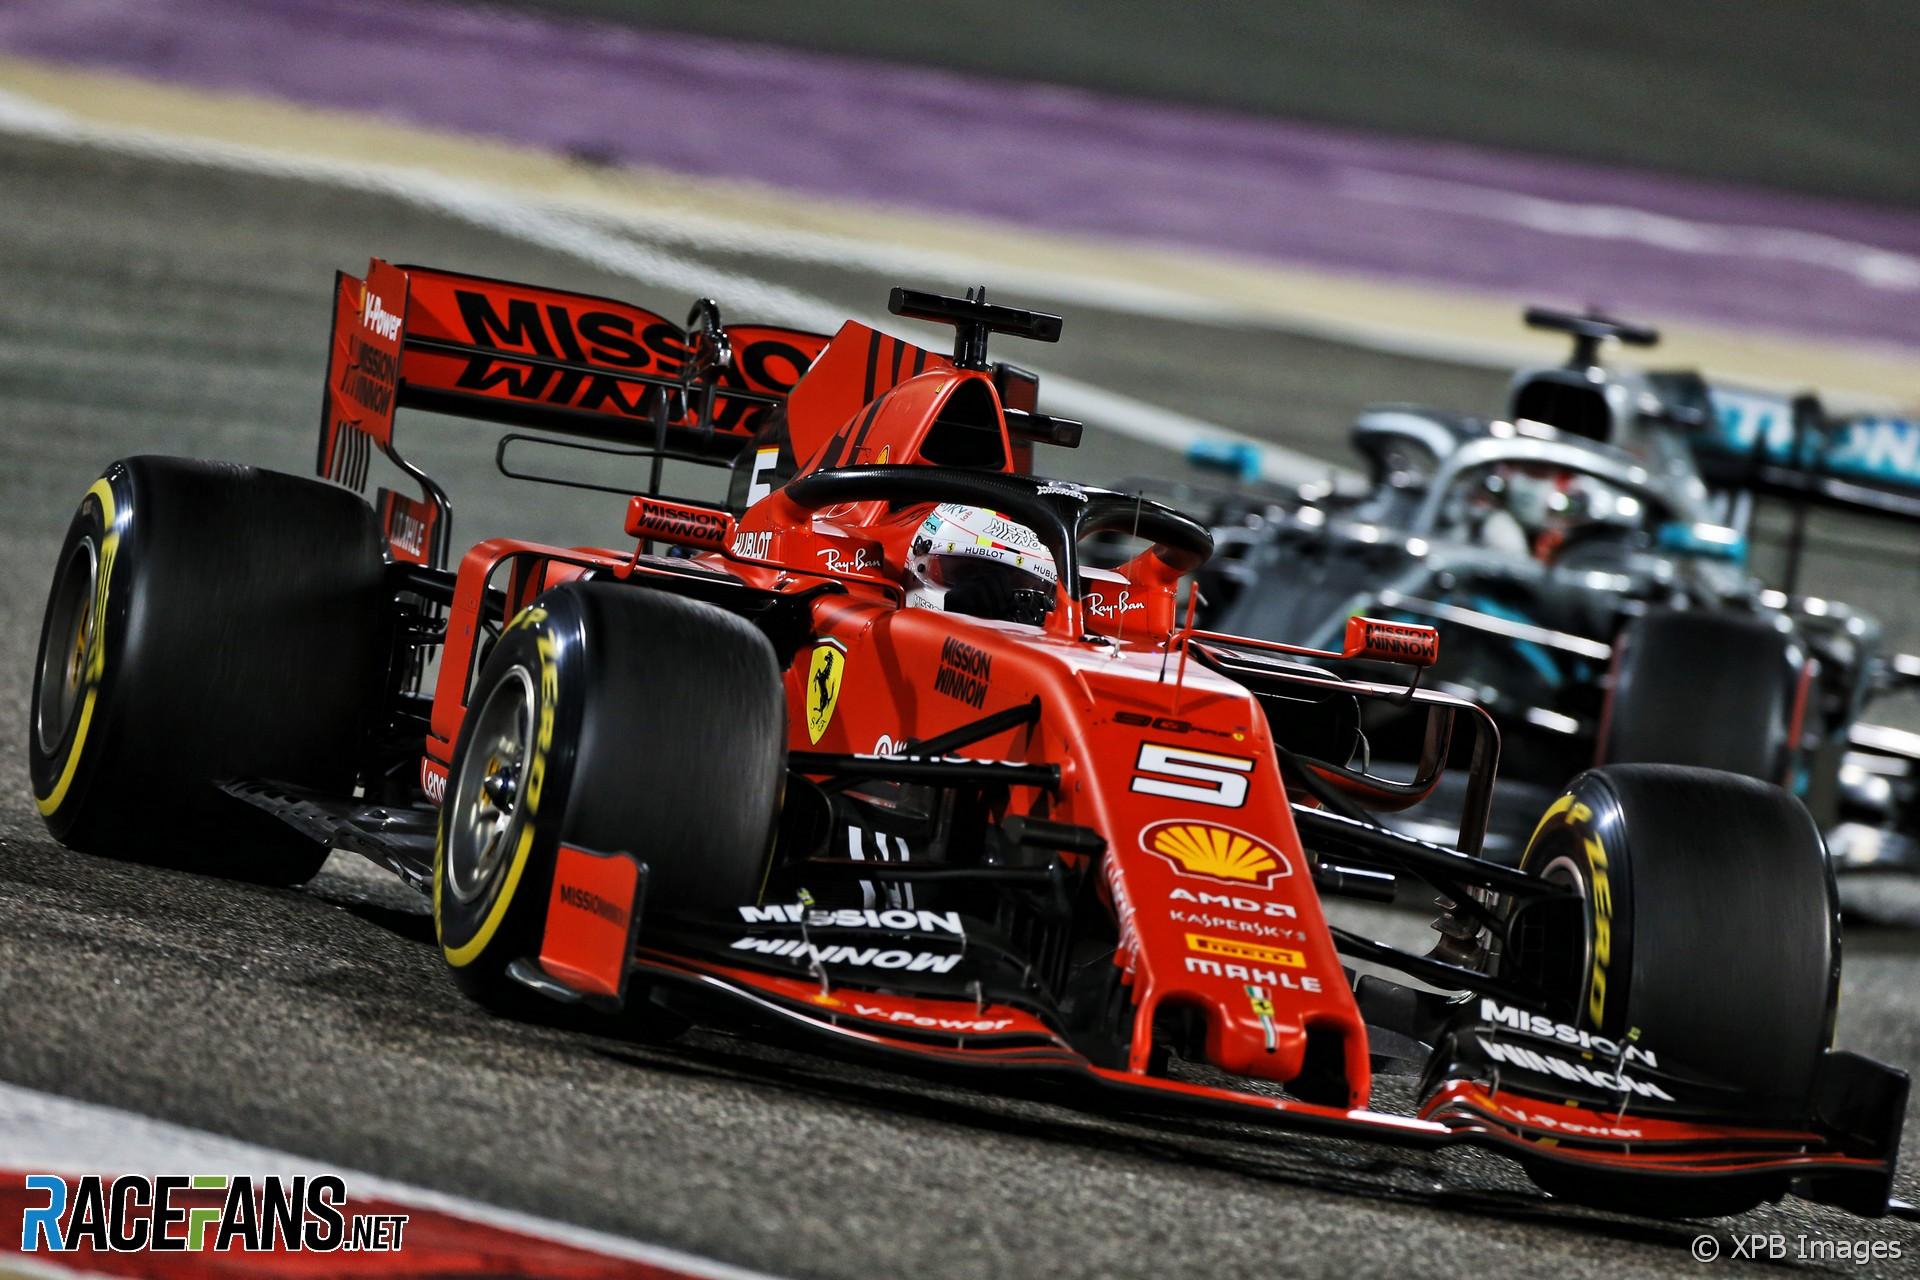 Sebastian Vettel, Lewis Hamilton, Bahrain International Circuit, 2019